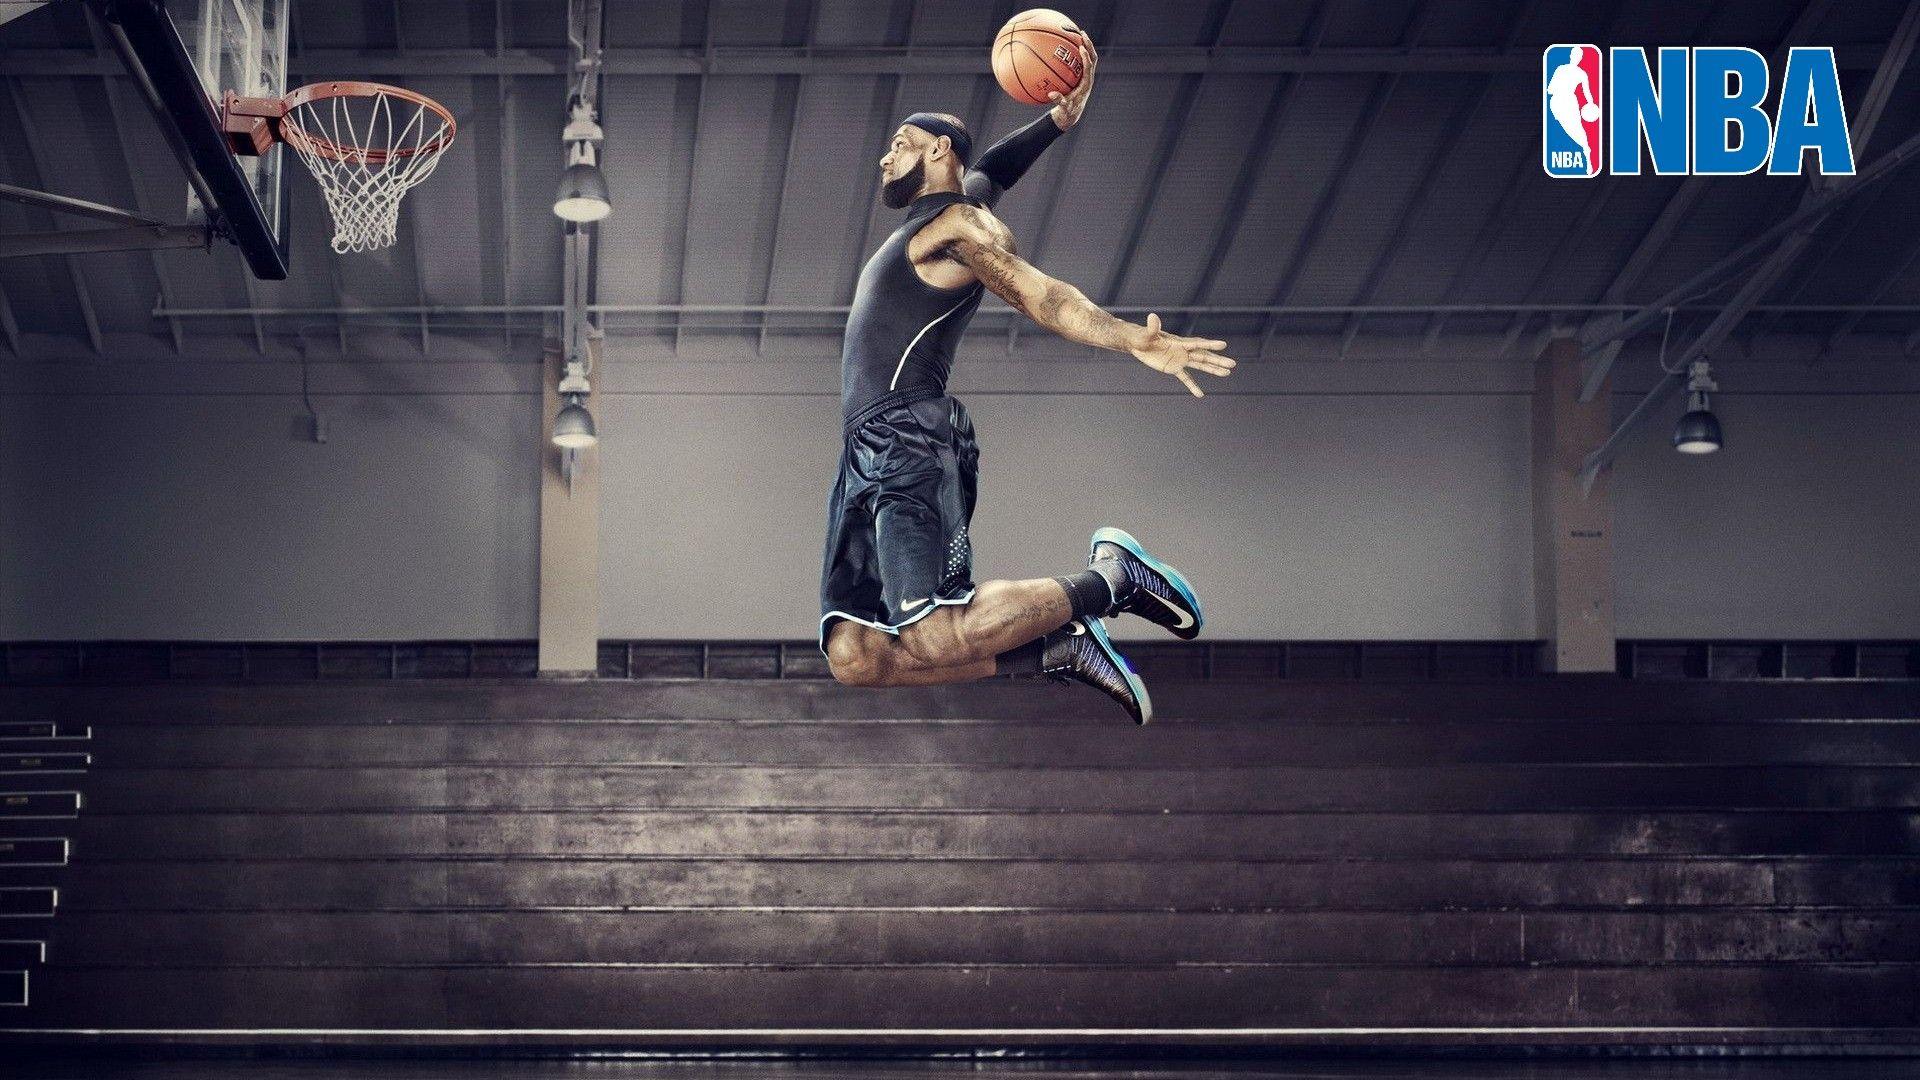 Wallpapers Hd Basketball Court 2021 Basketball Wallpaper Nike Training Training Motivation Pictures Basketball Wallpaper